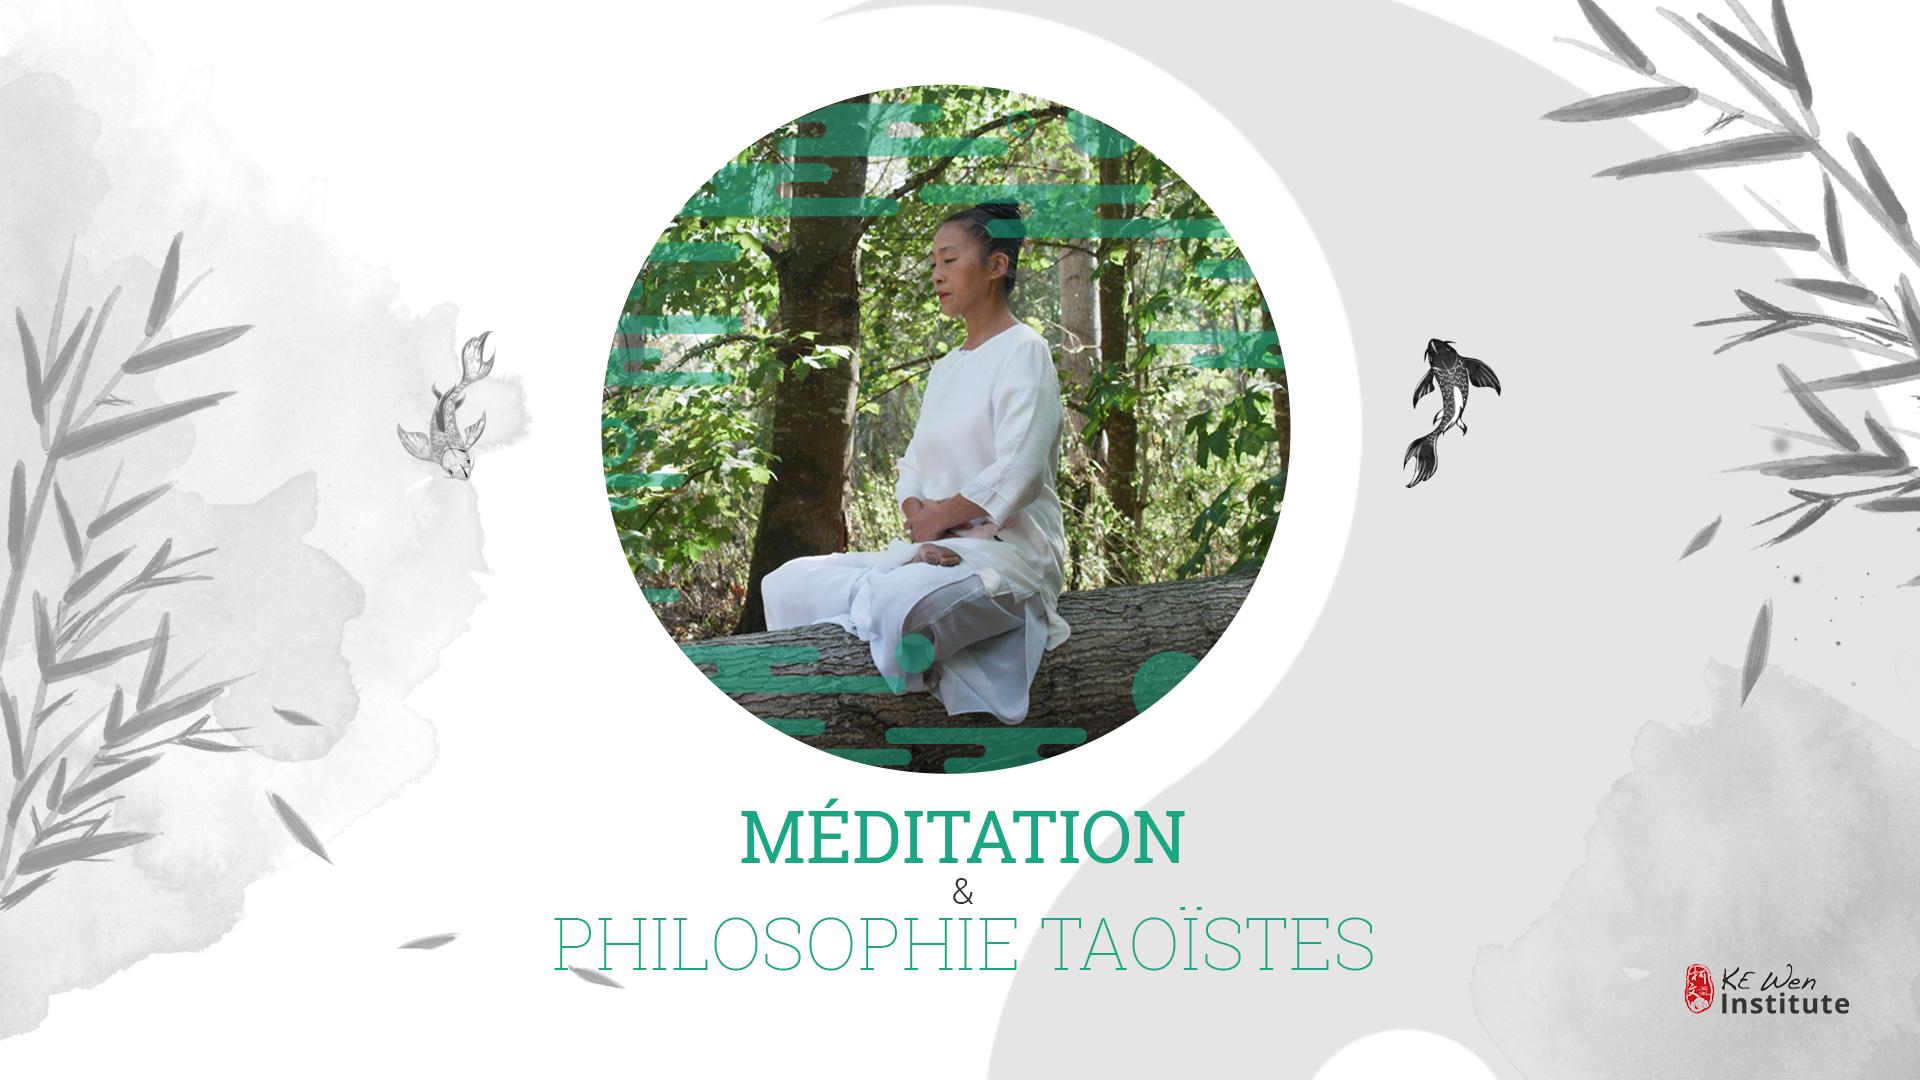 méditation et philosophie taoiste copie